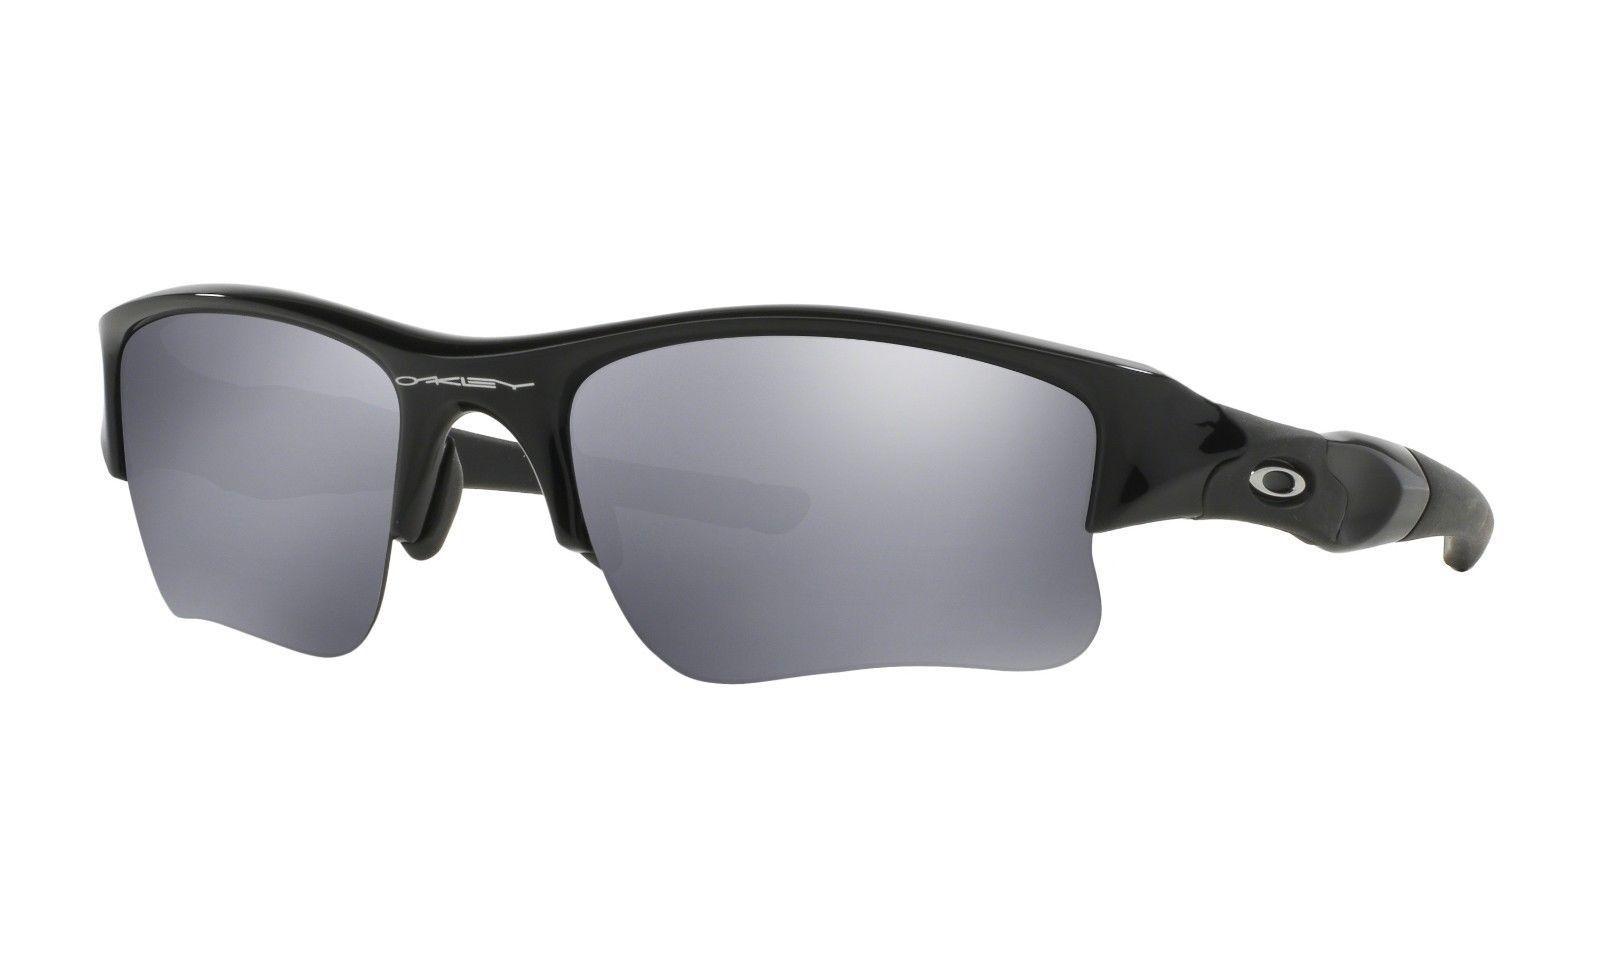 47bc1b05b24 Oakley Flak Sunglasses 03-915 Black for sale online